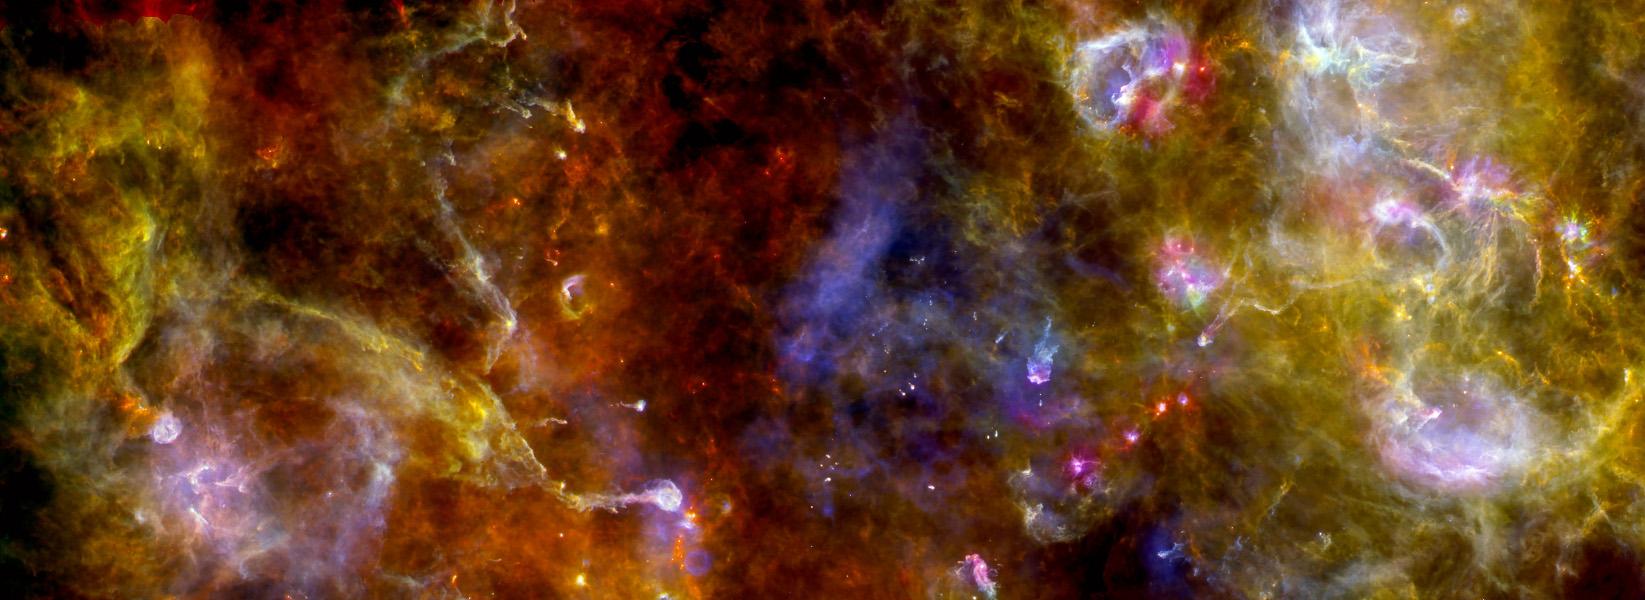 http://apod.nasa.gov/apod/image/1205/Herschel_cygnusX_04052012_H600.jpg